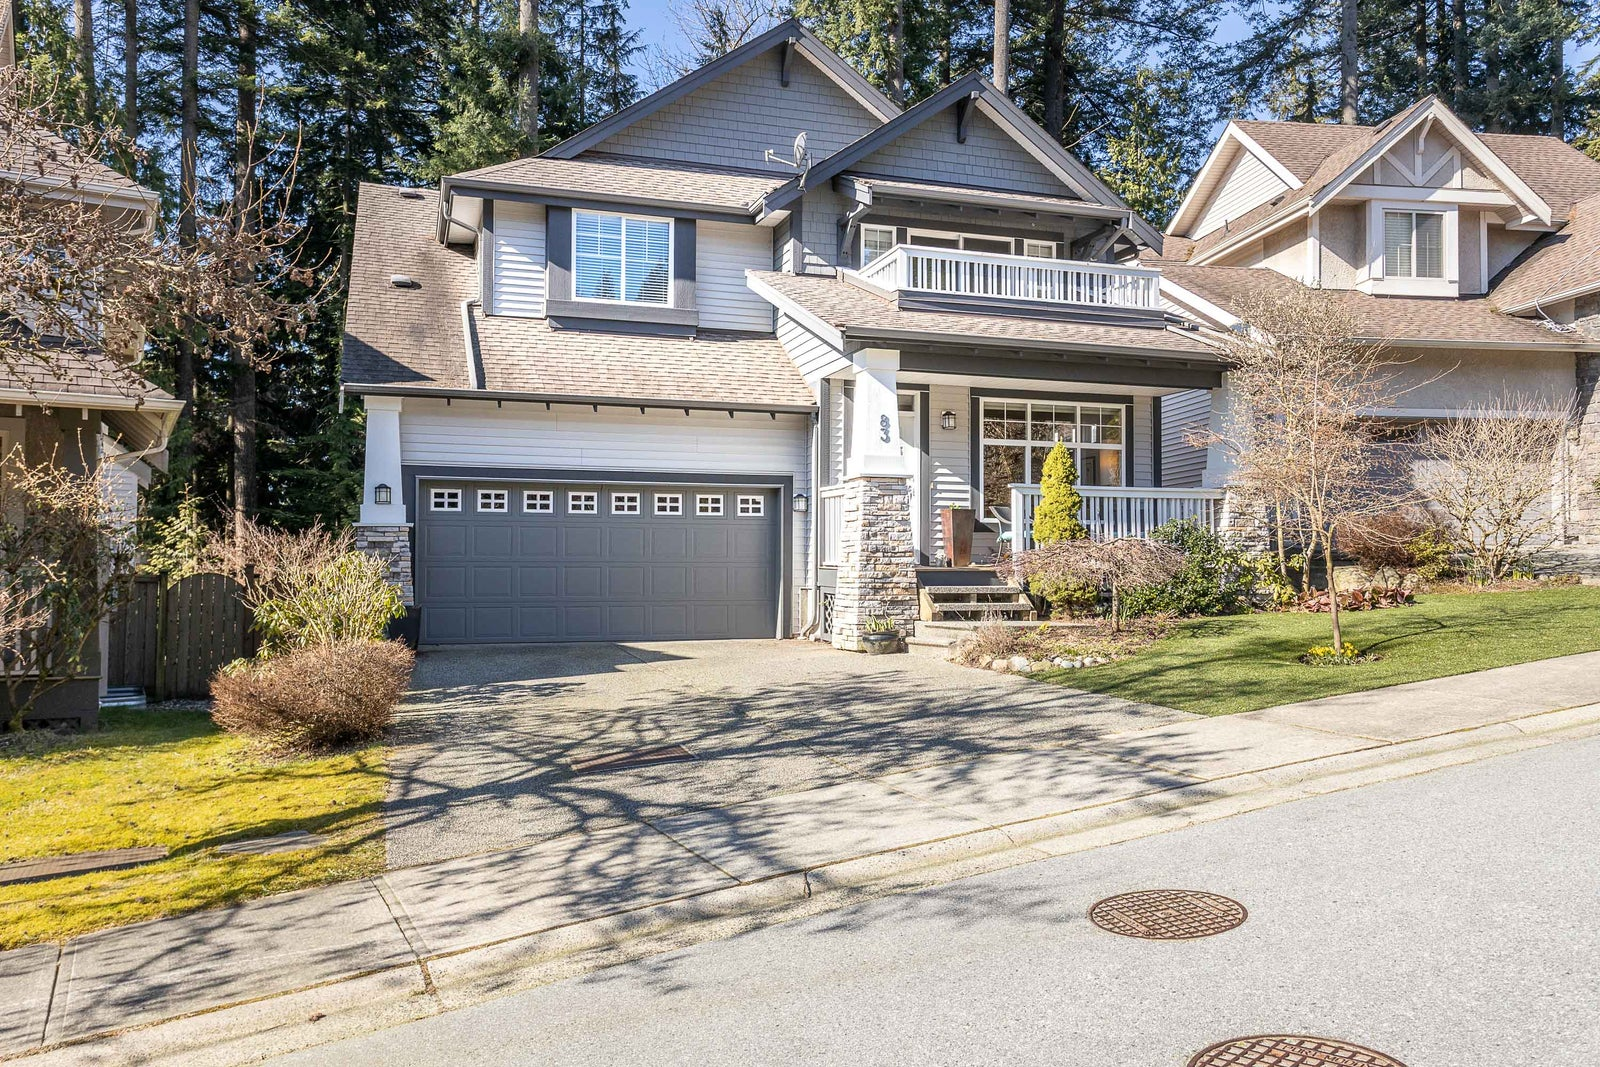 Buyer's Guide- HOME BUYERS RESOURCE | www.lolaoduwole.com